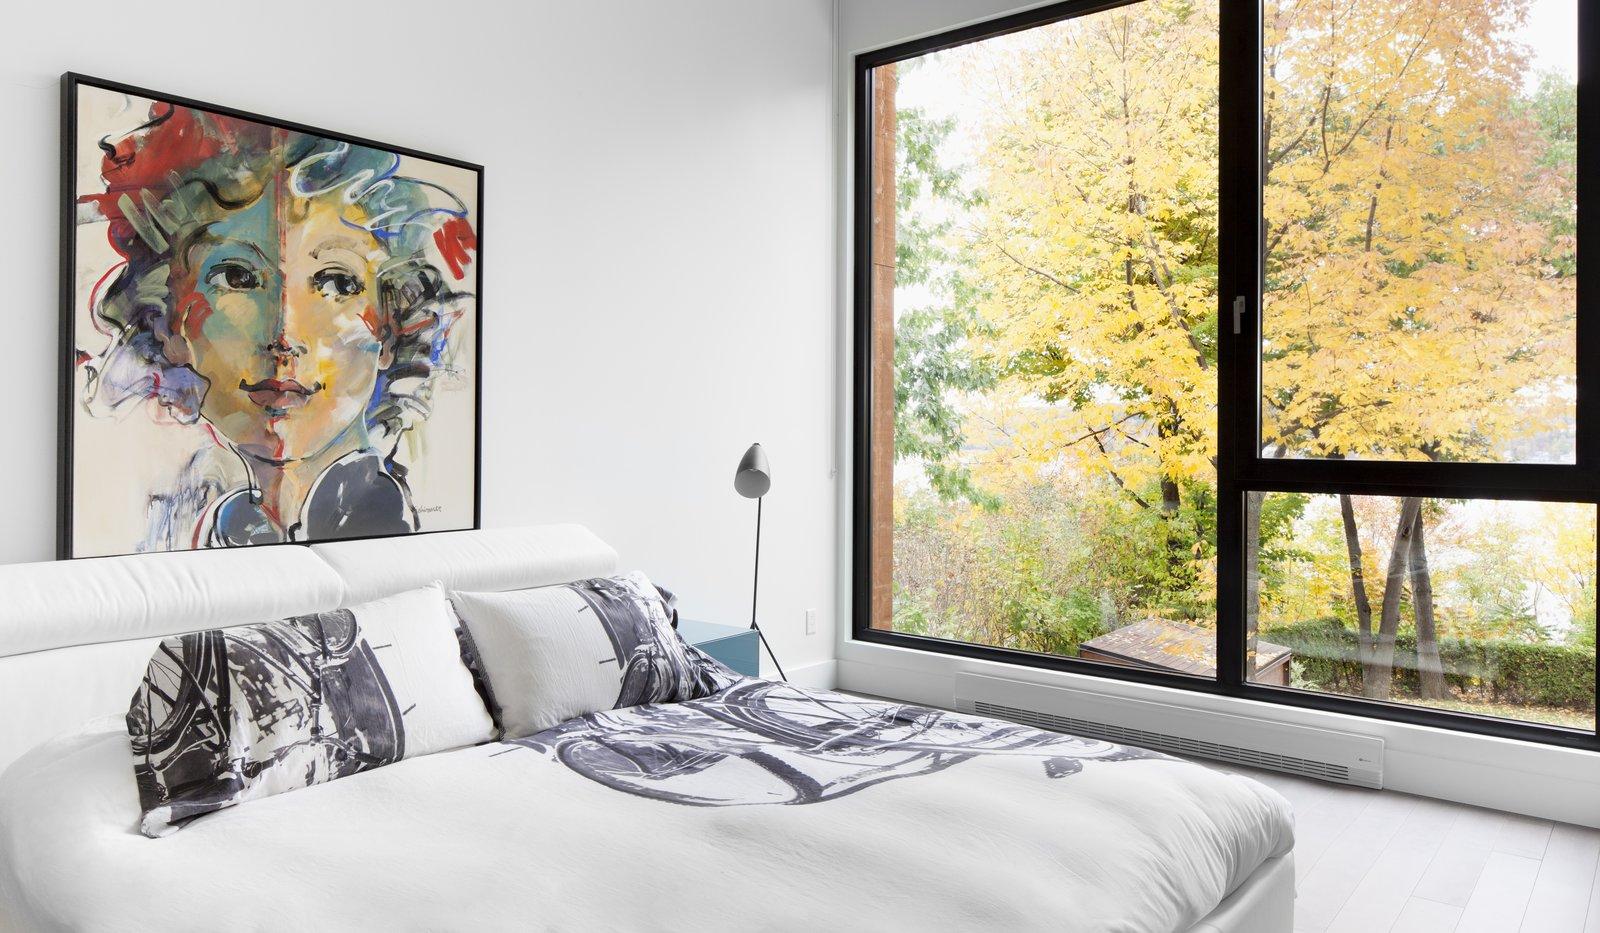 Bedroom at Rue de l'Anse residence - PARKA Architecture & Design - Quebec city, Canada  Rue de l'Anse residence by PARKA - Architecture & Design